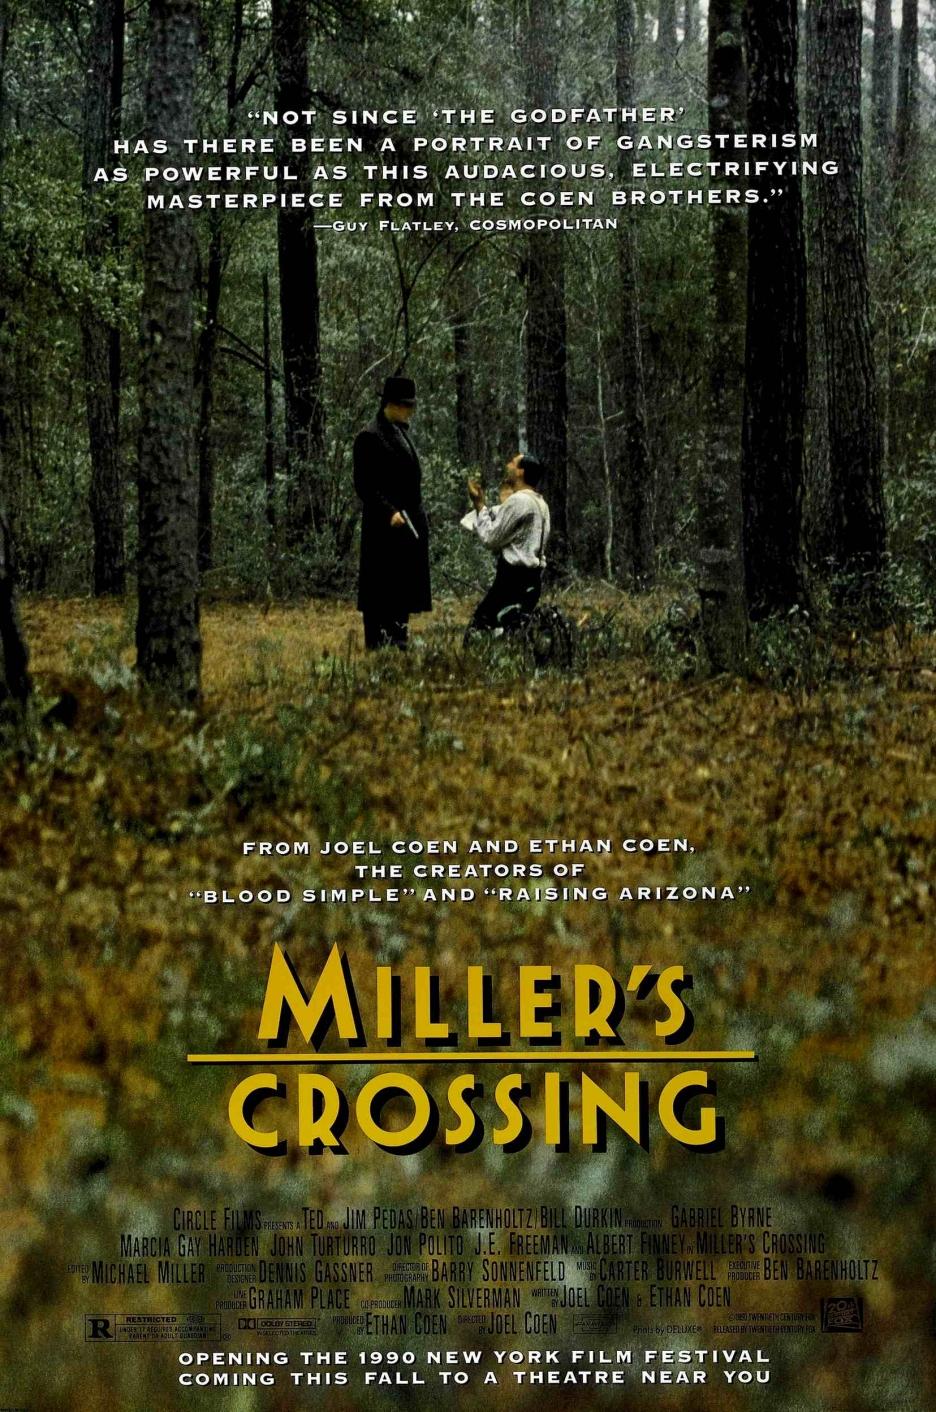 MILLER'S CROSSING des frères Coen